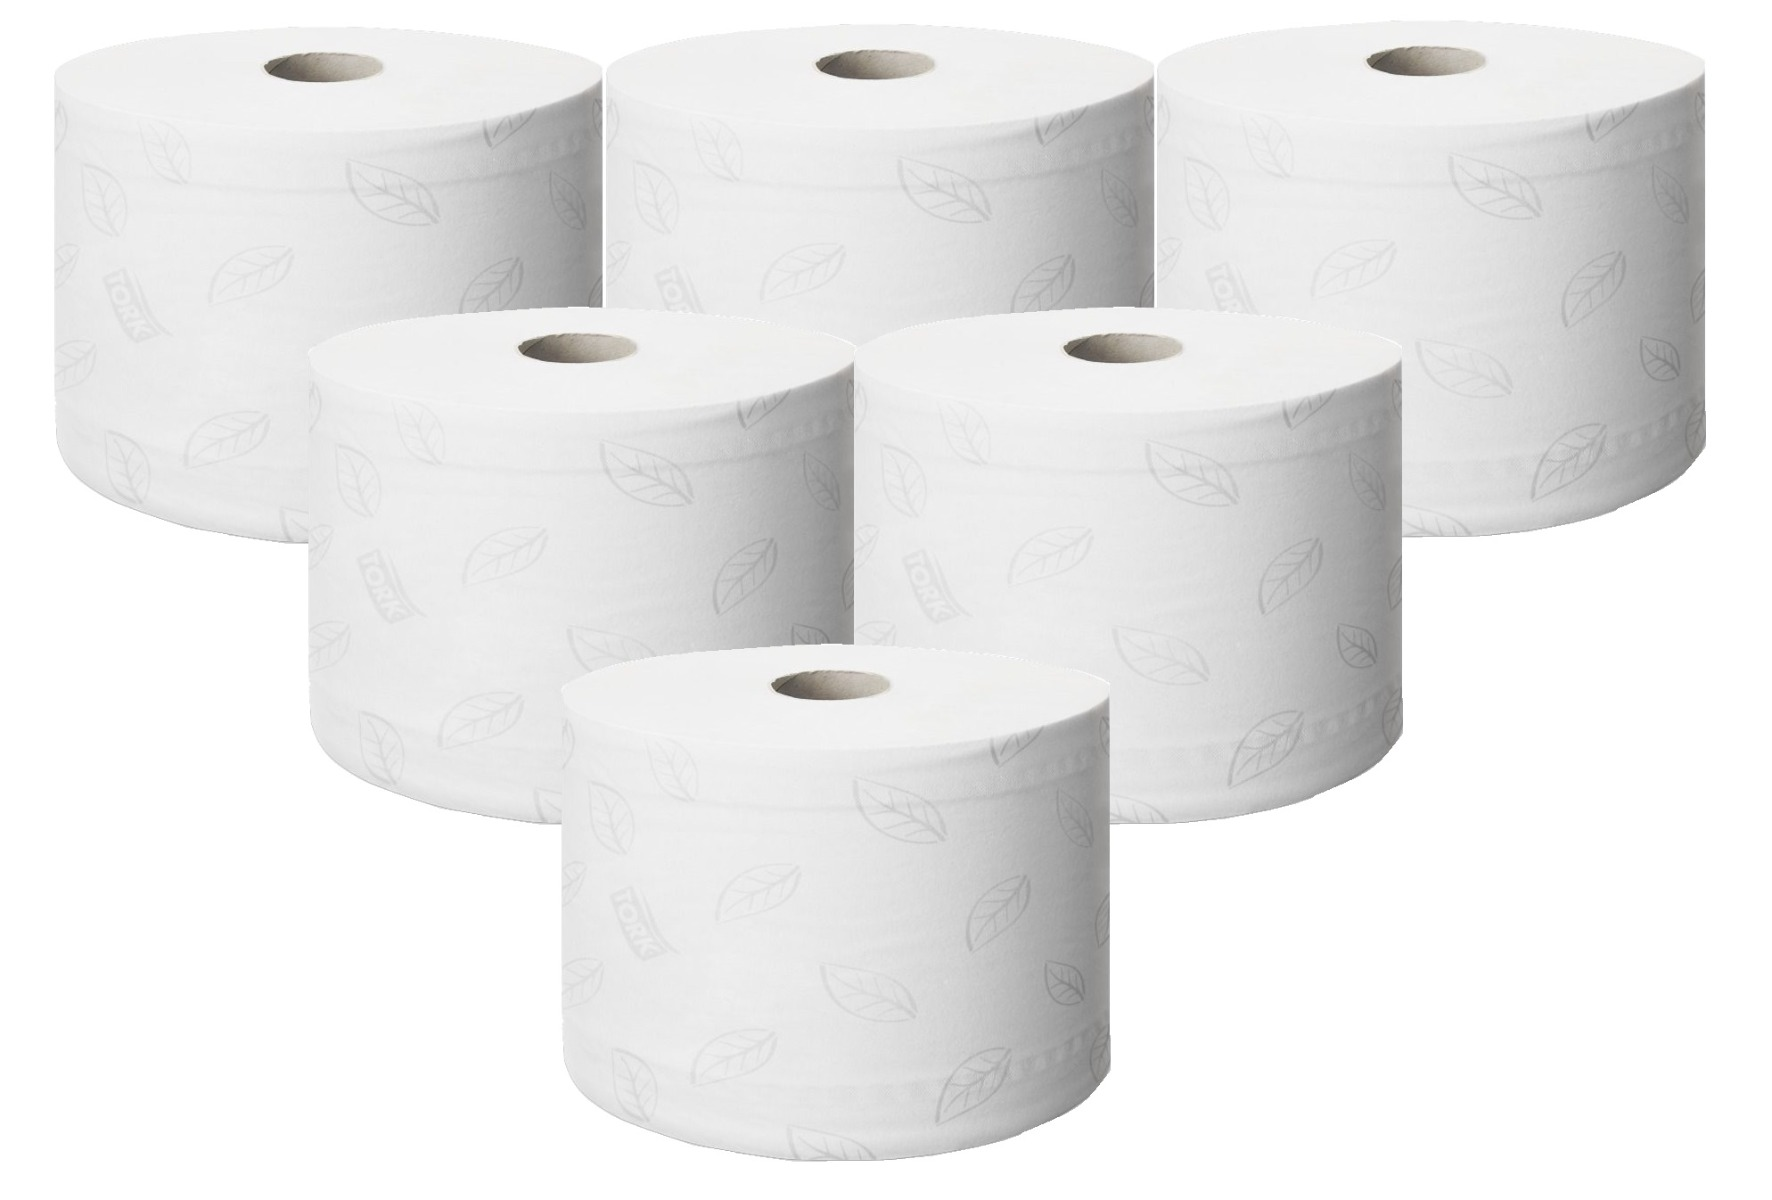 Tork SmartOne® Toilet Tissue Roll 2 Ply (Case of 6) - 472242